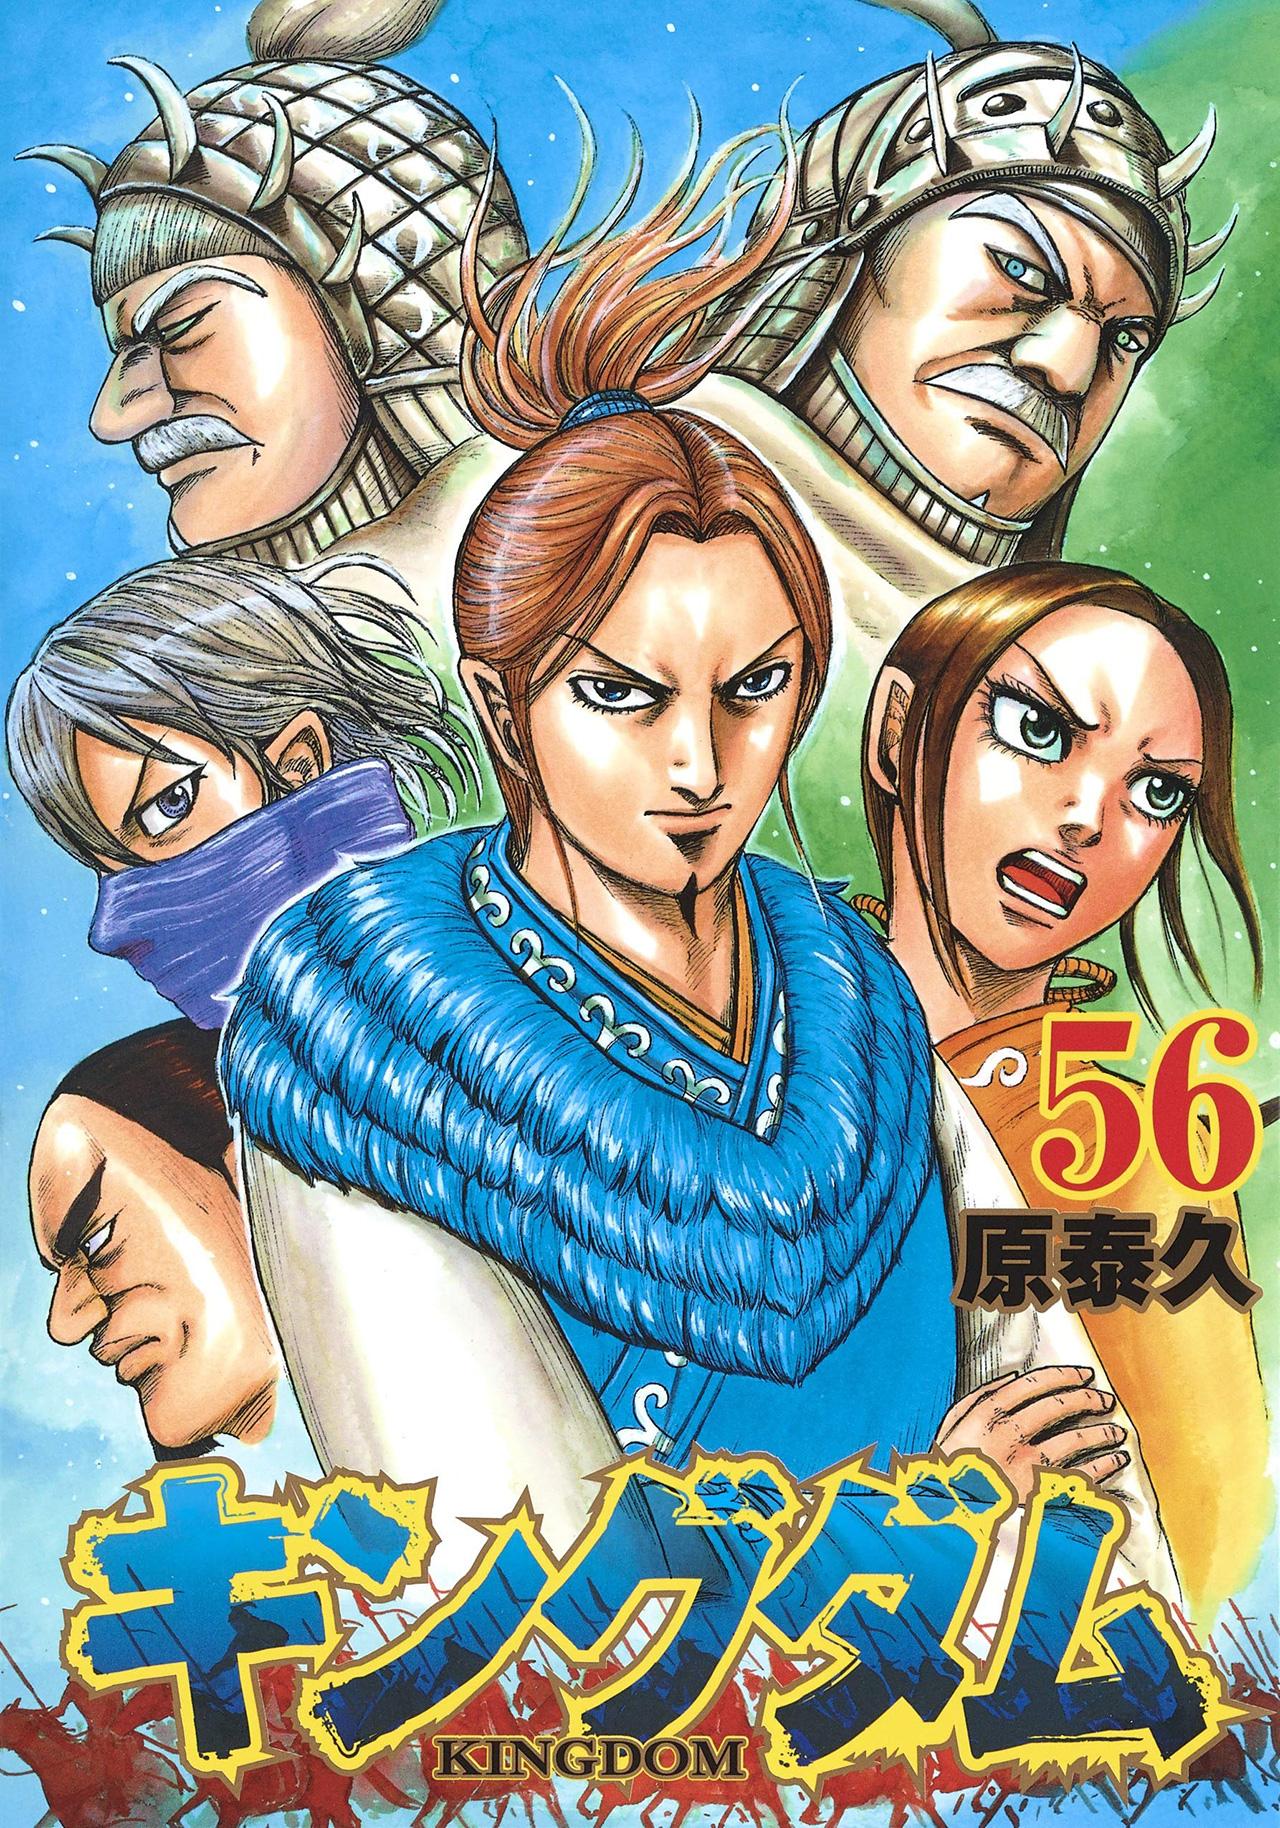 Capa do volume 56 de Kingdom